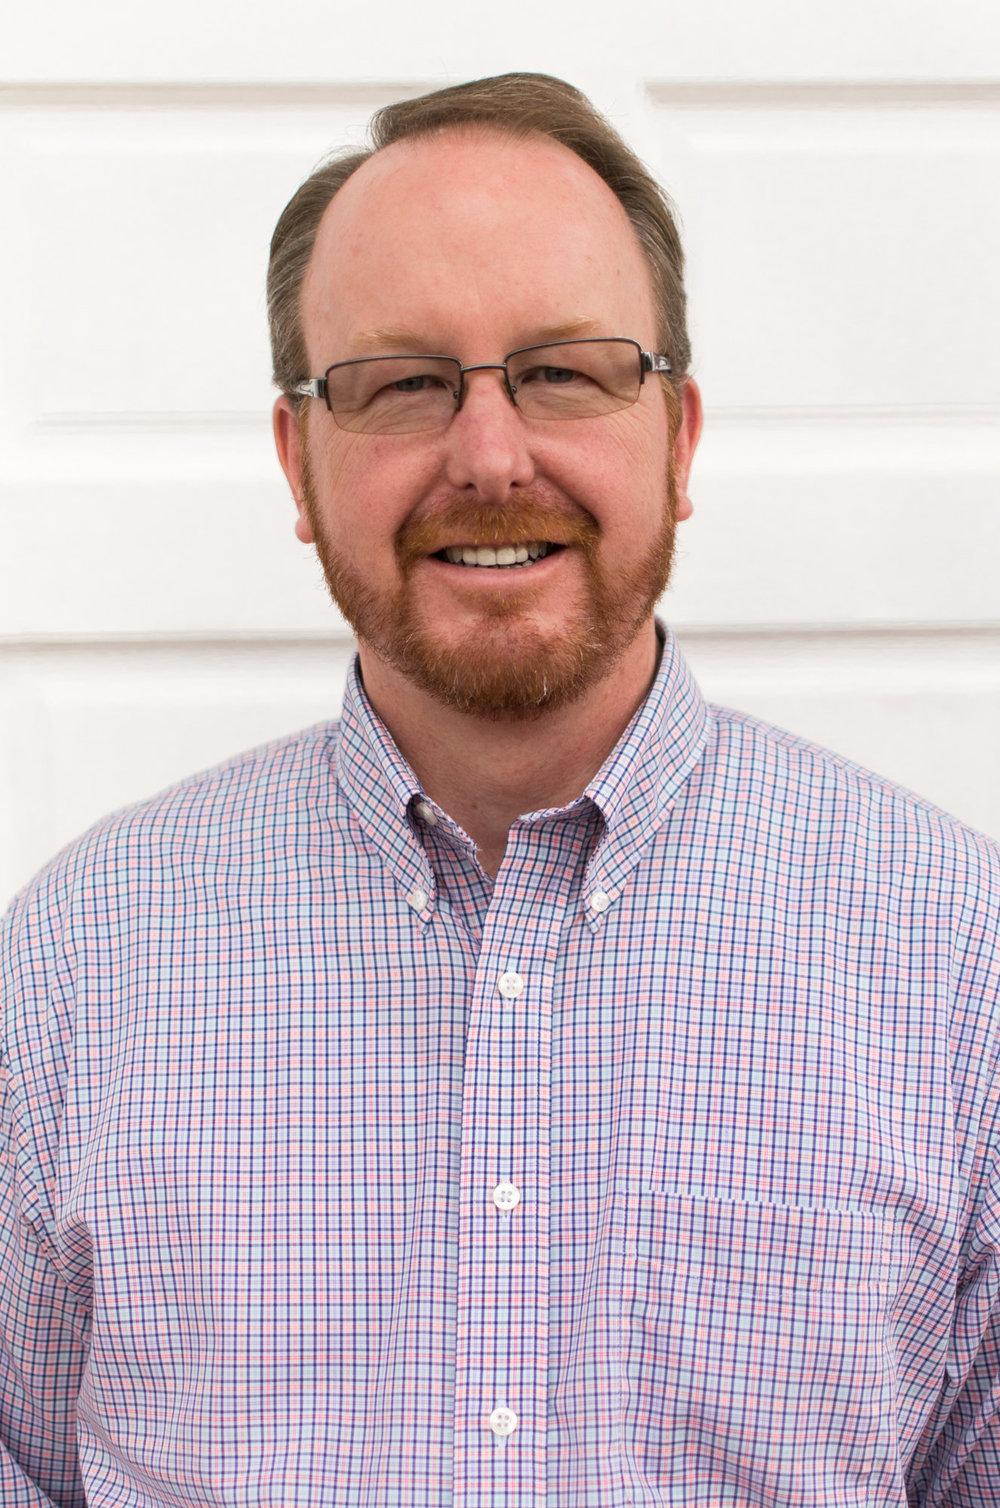 Scott FitzSimmons - Discipleship & Student Pastorscott@mbcgreenville.com